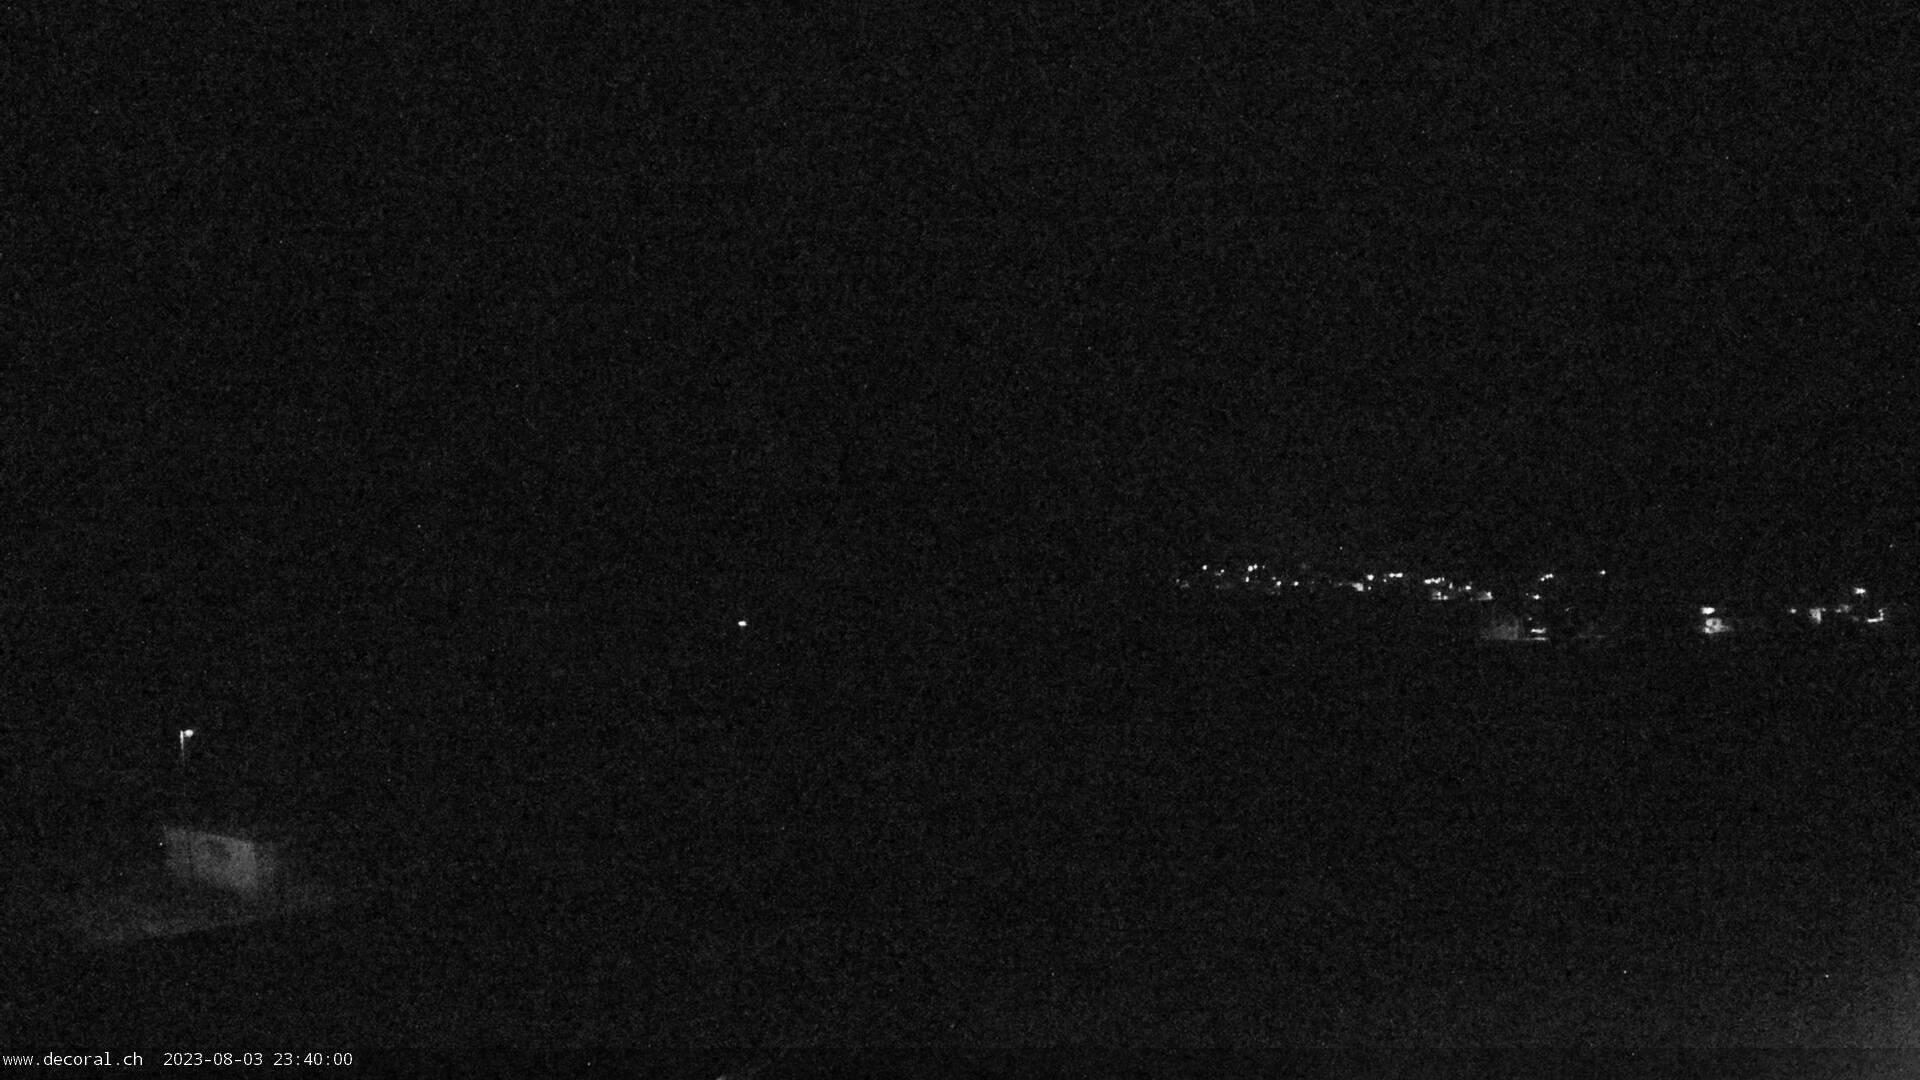 Braunwald - Grosstal Tödi